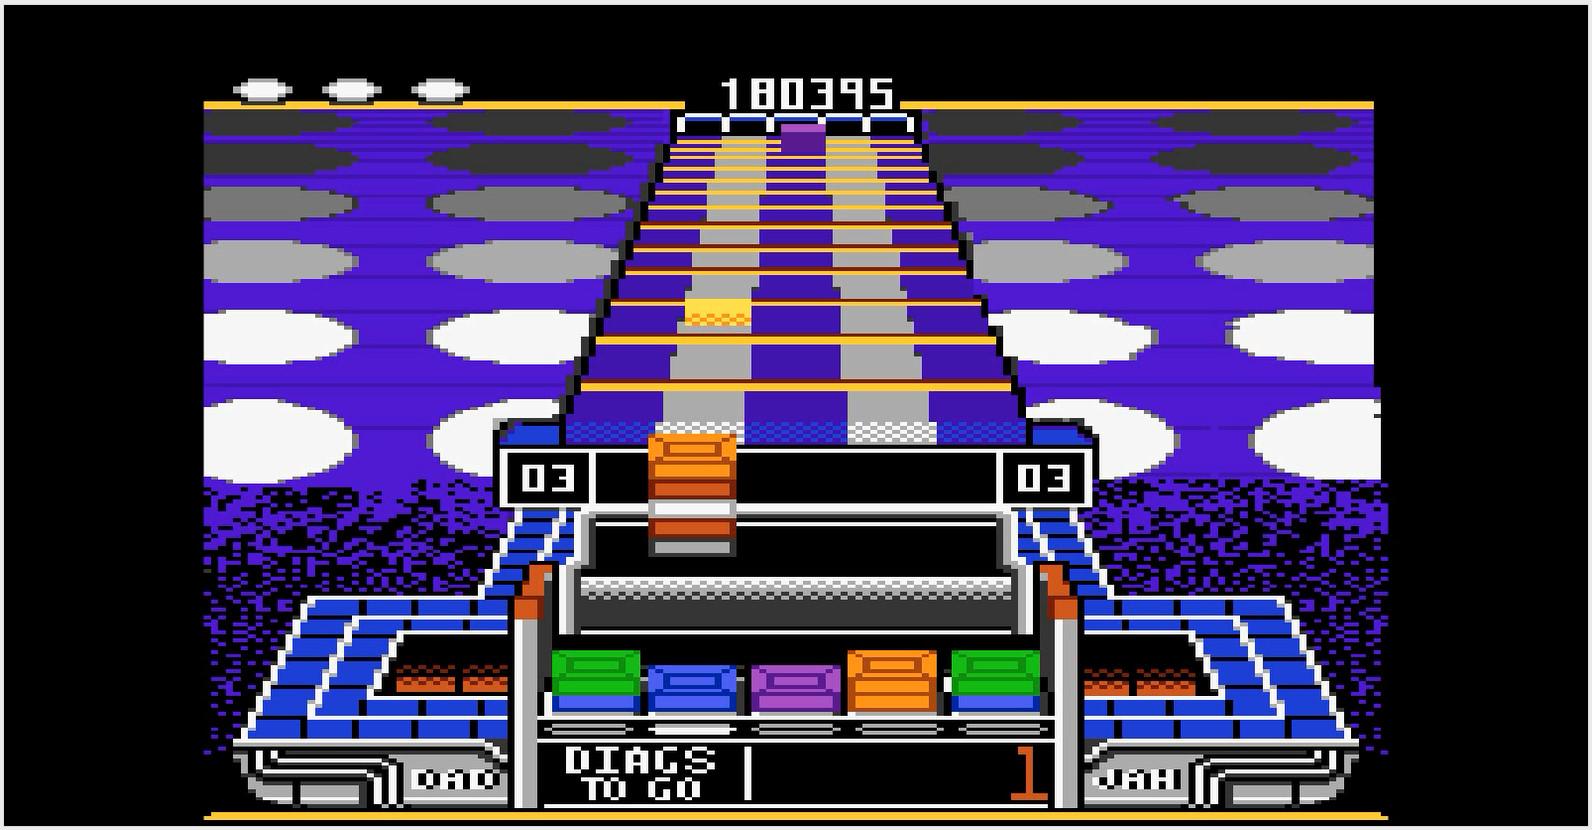 Klax: Hard [Level 01 Start] 180,395 points